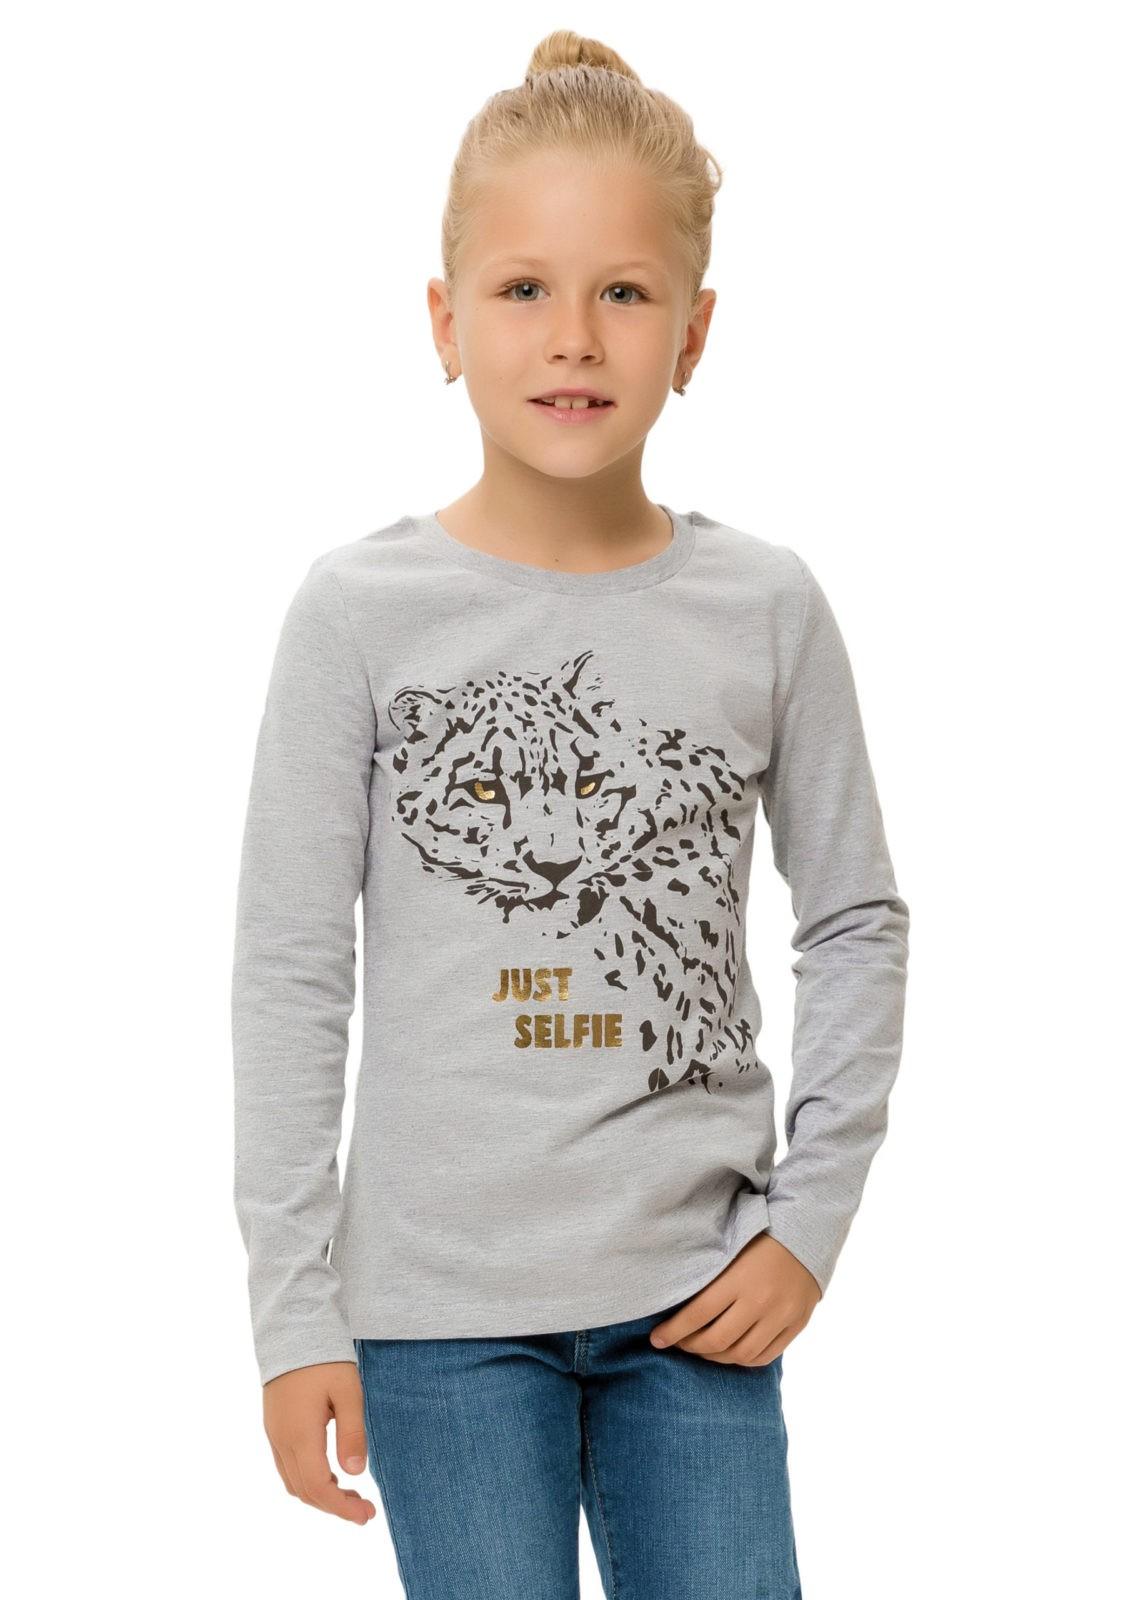 Dívčí tričko Just Selfie Šedý melanž